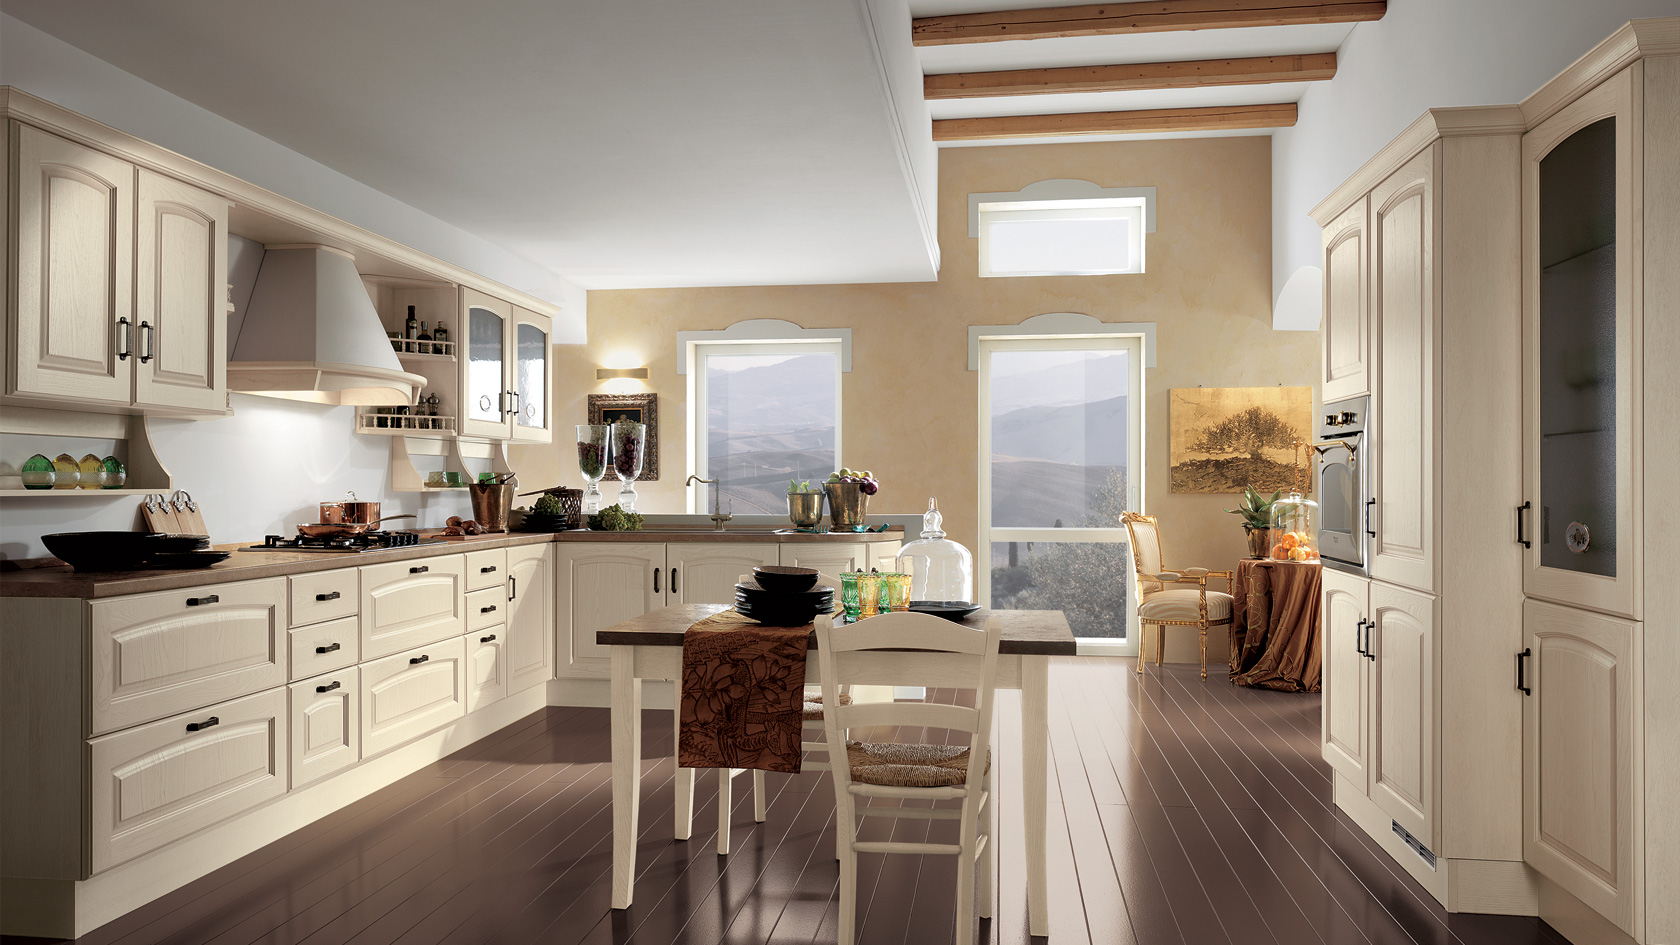 Emejing Cucine Scavolini Prezzi Linea Basic Photos - Ideas ...